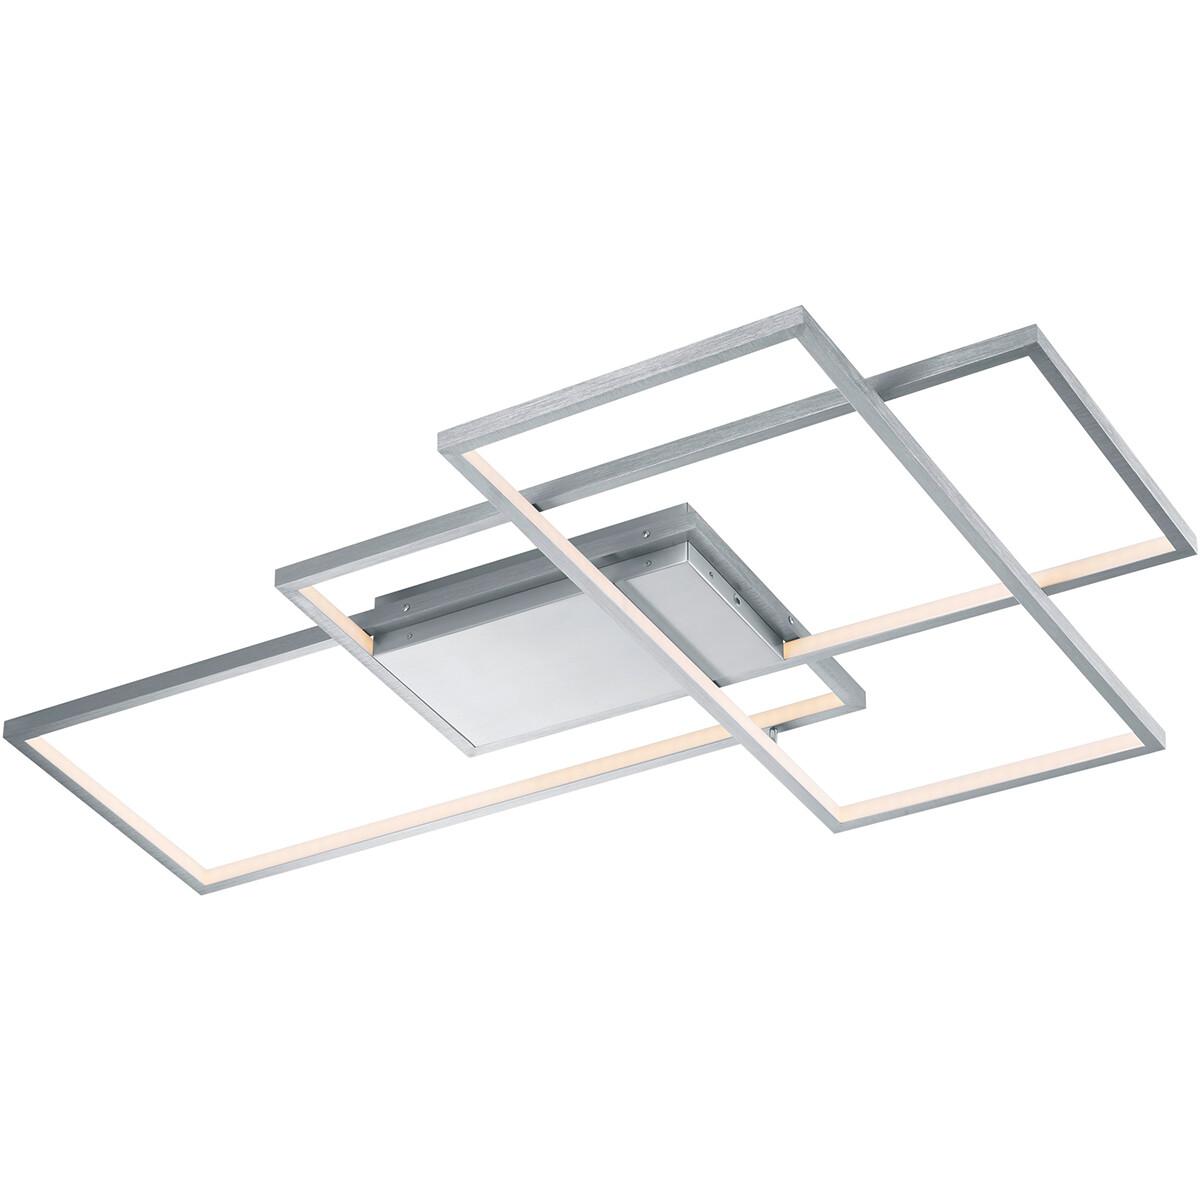 LED Plafondlamp WiZ - Smart LED - Plafondverlichting - Trion Tiagi - 40W - Aanpasbare Kleur - RGBW -